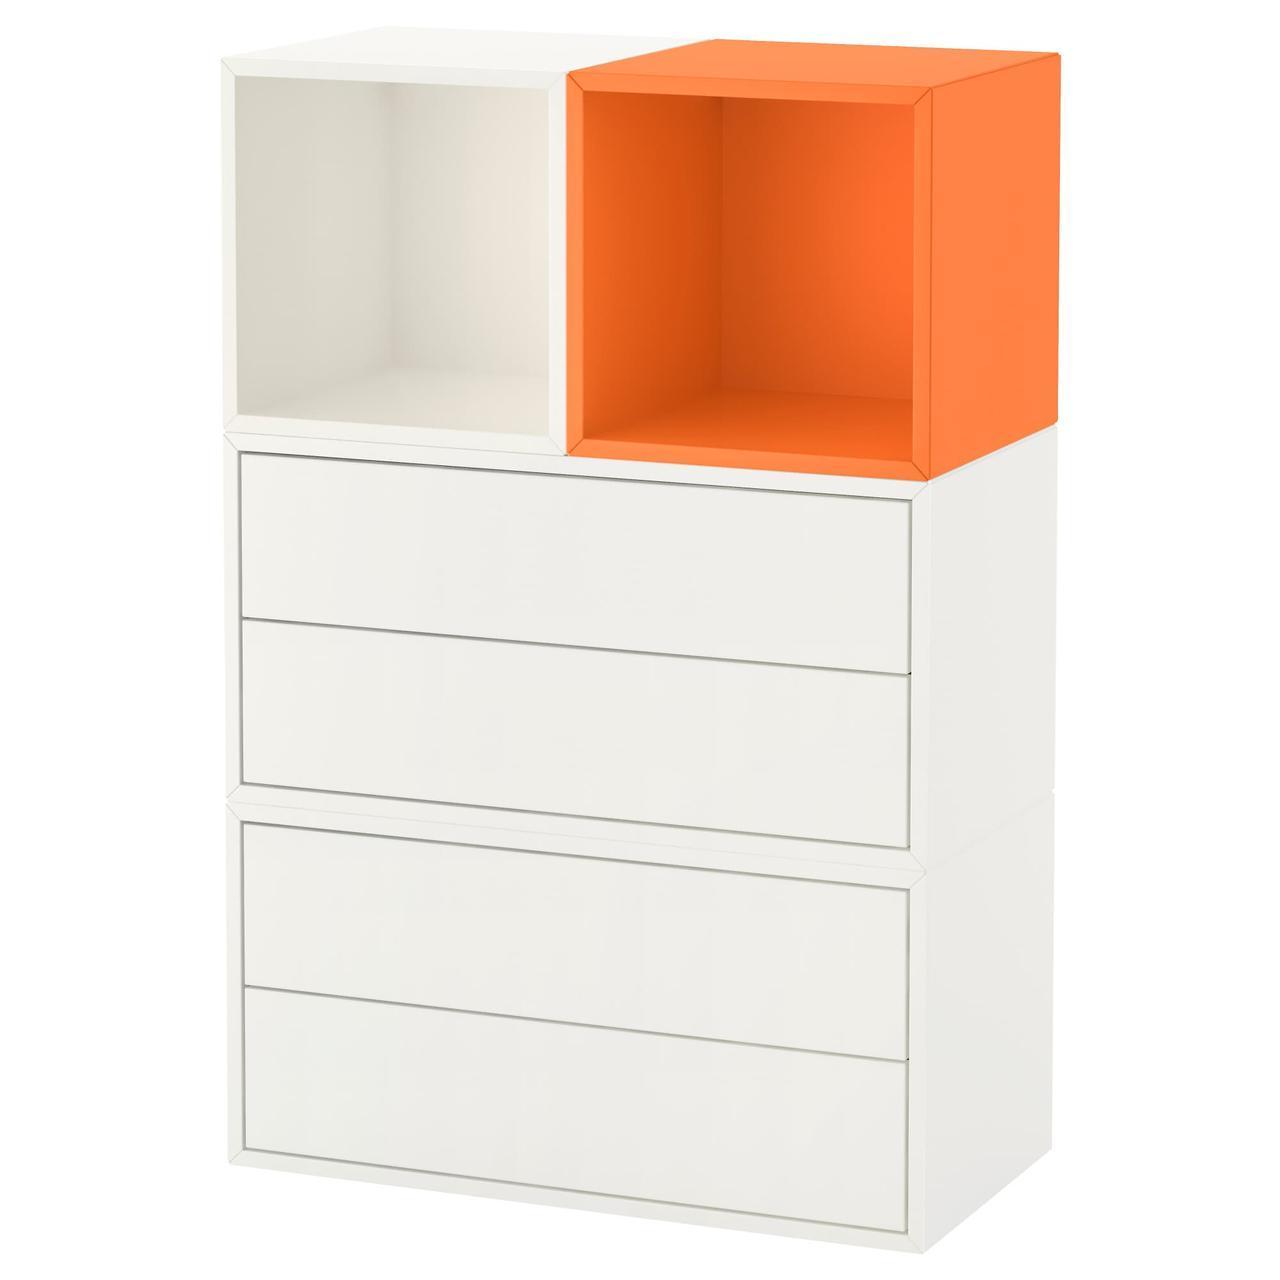 IKEA EKET Настенный стеллаж, белый, оранжевый  (392.210.34)